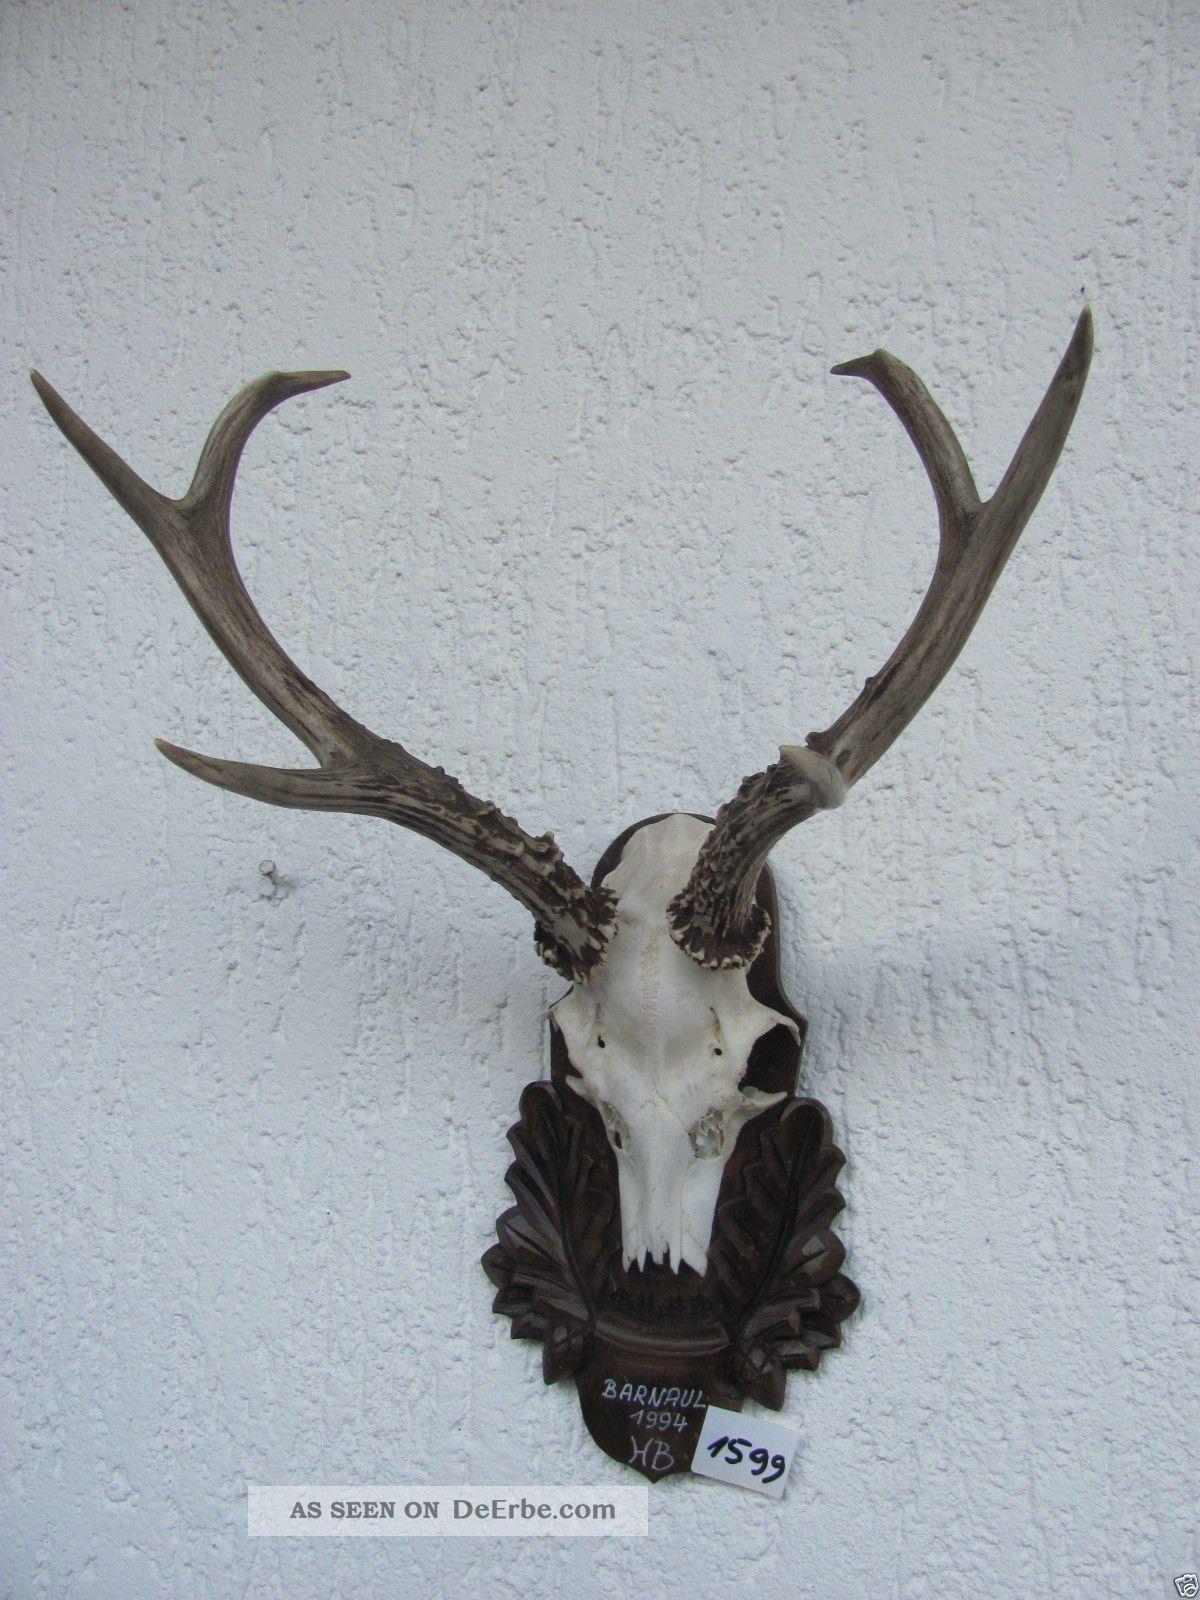 Kap.  Sibir.  Sechser GehÖrn 448g Sibirien Geweih 1599 TrophÄe Deko Bock Antlers Jagd & Fischen Bild